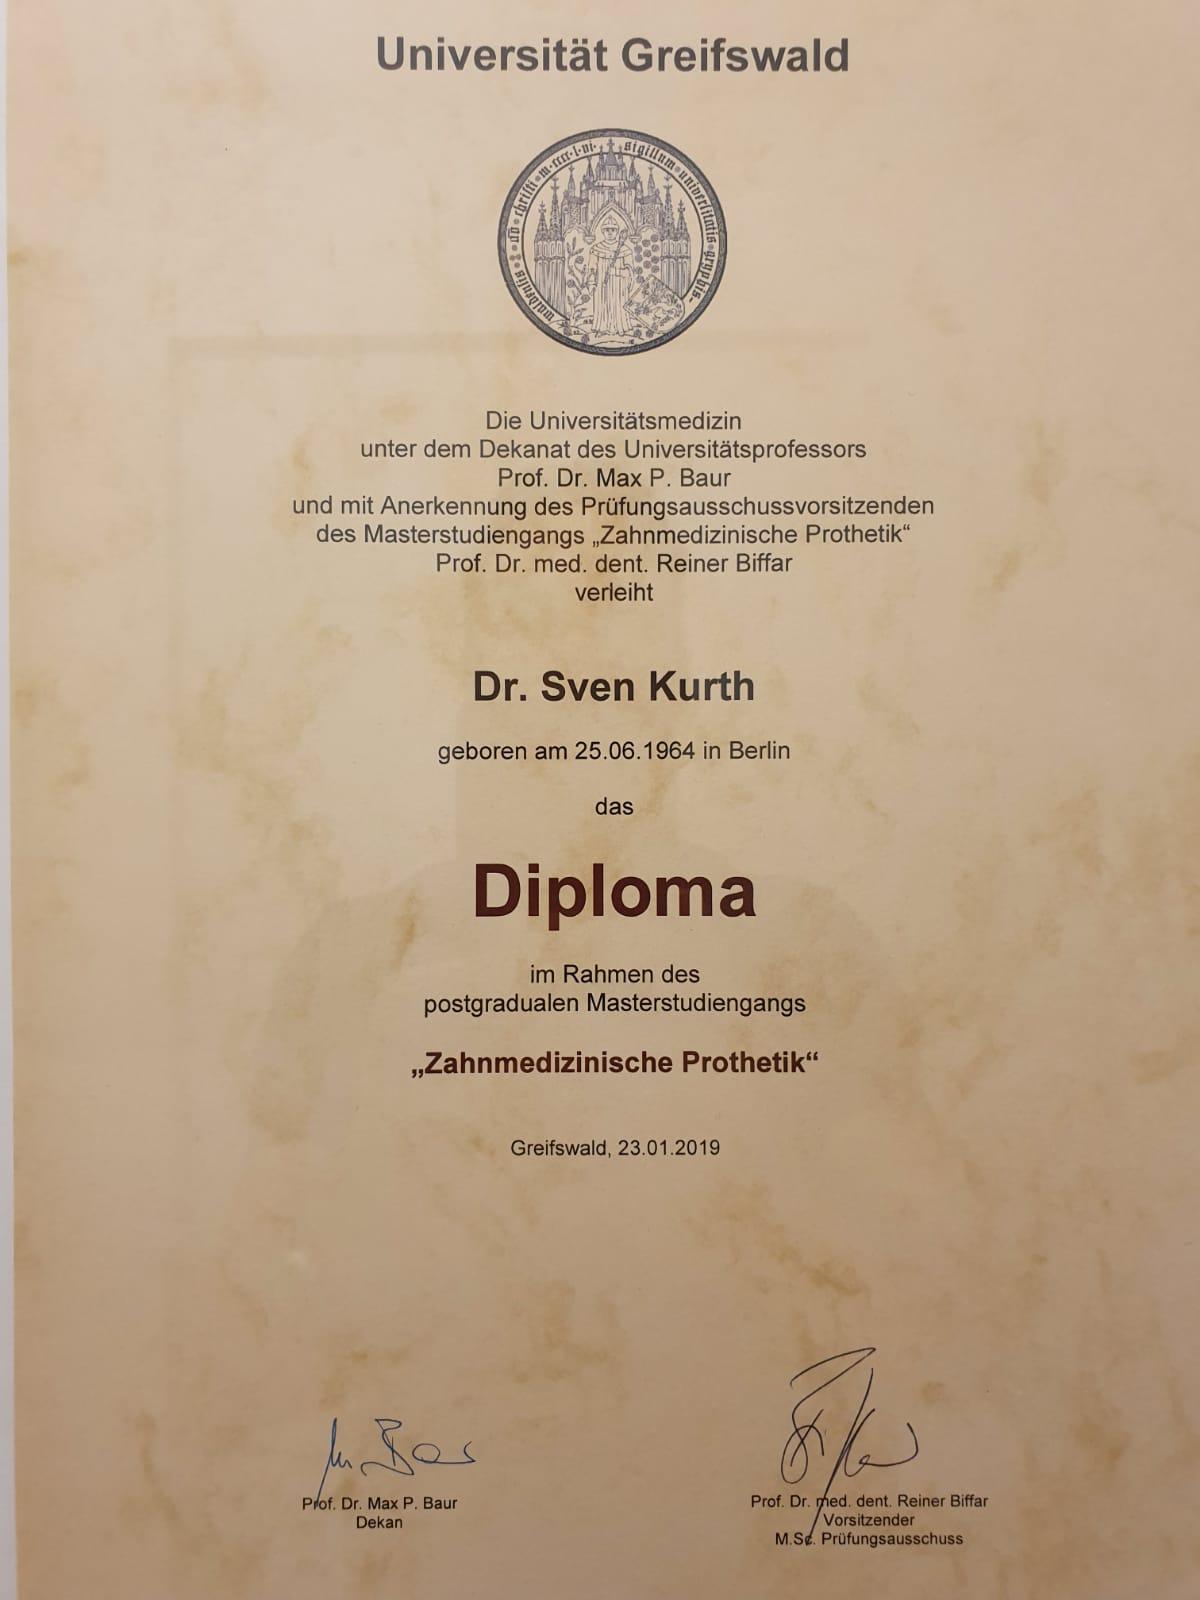 Diploma in Prothetik für Dr. Sven Kurth.